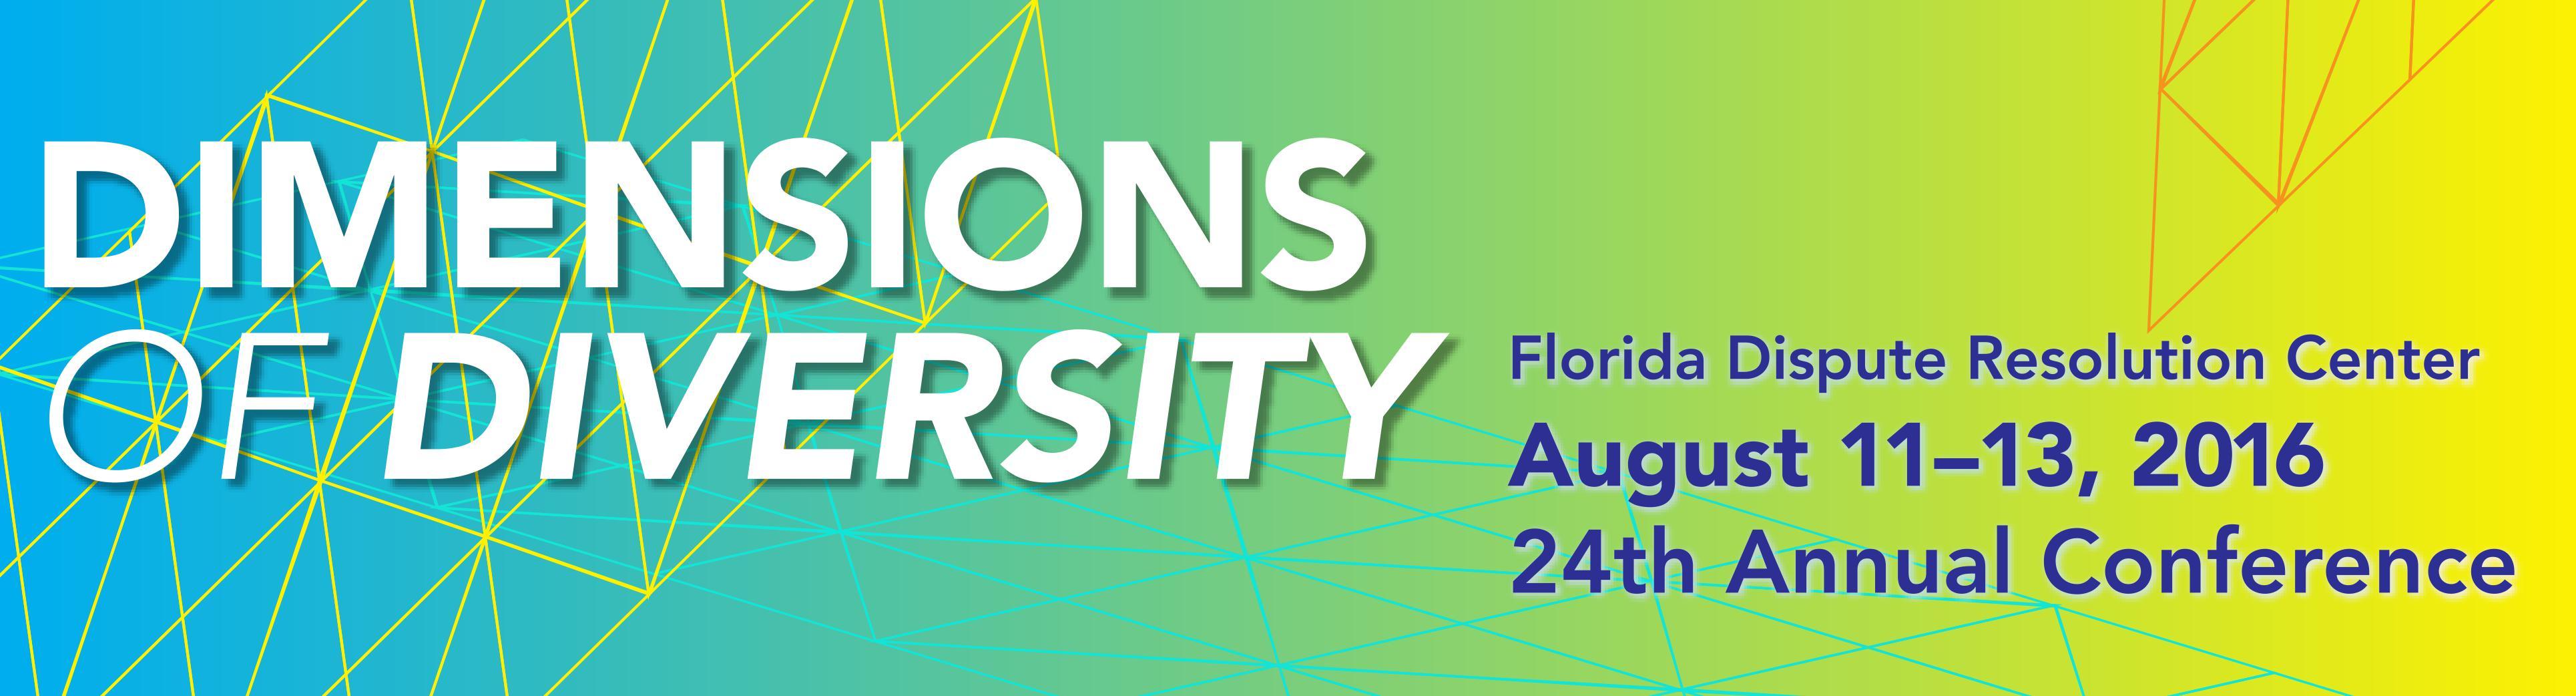 2016 Florida Dispute Resolution Center Conference